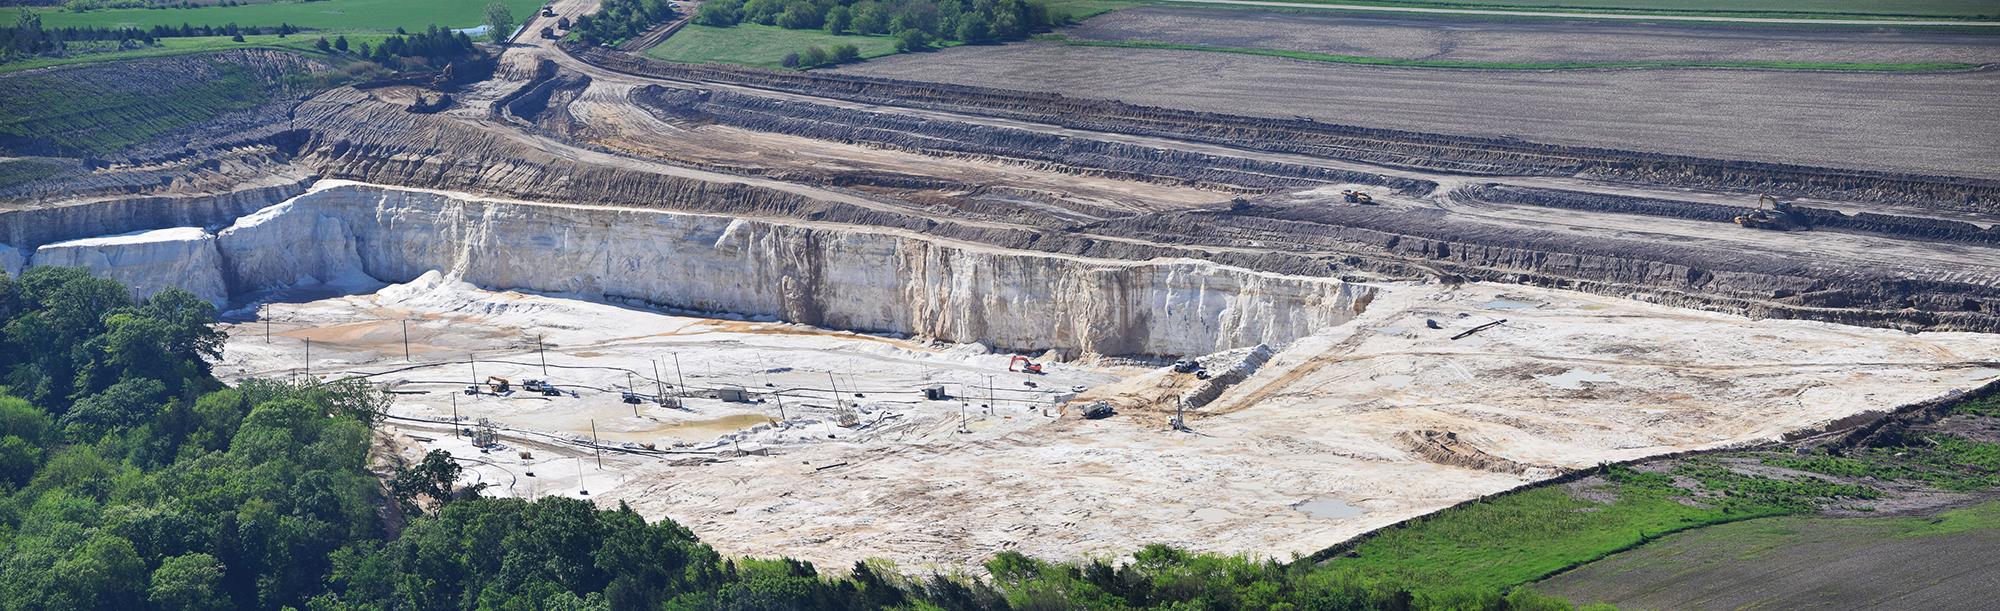 Fairmount Santrol frac sand mine and processing site. Wedron, IL.